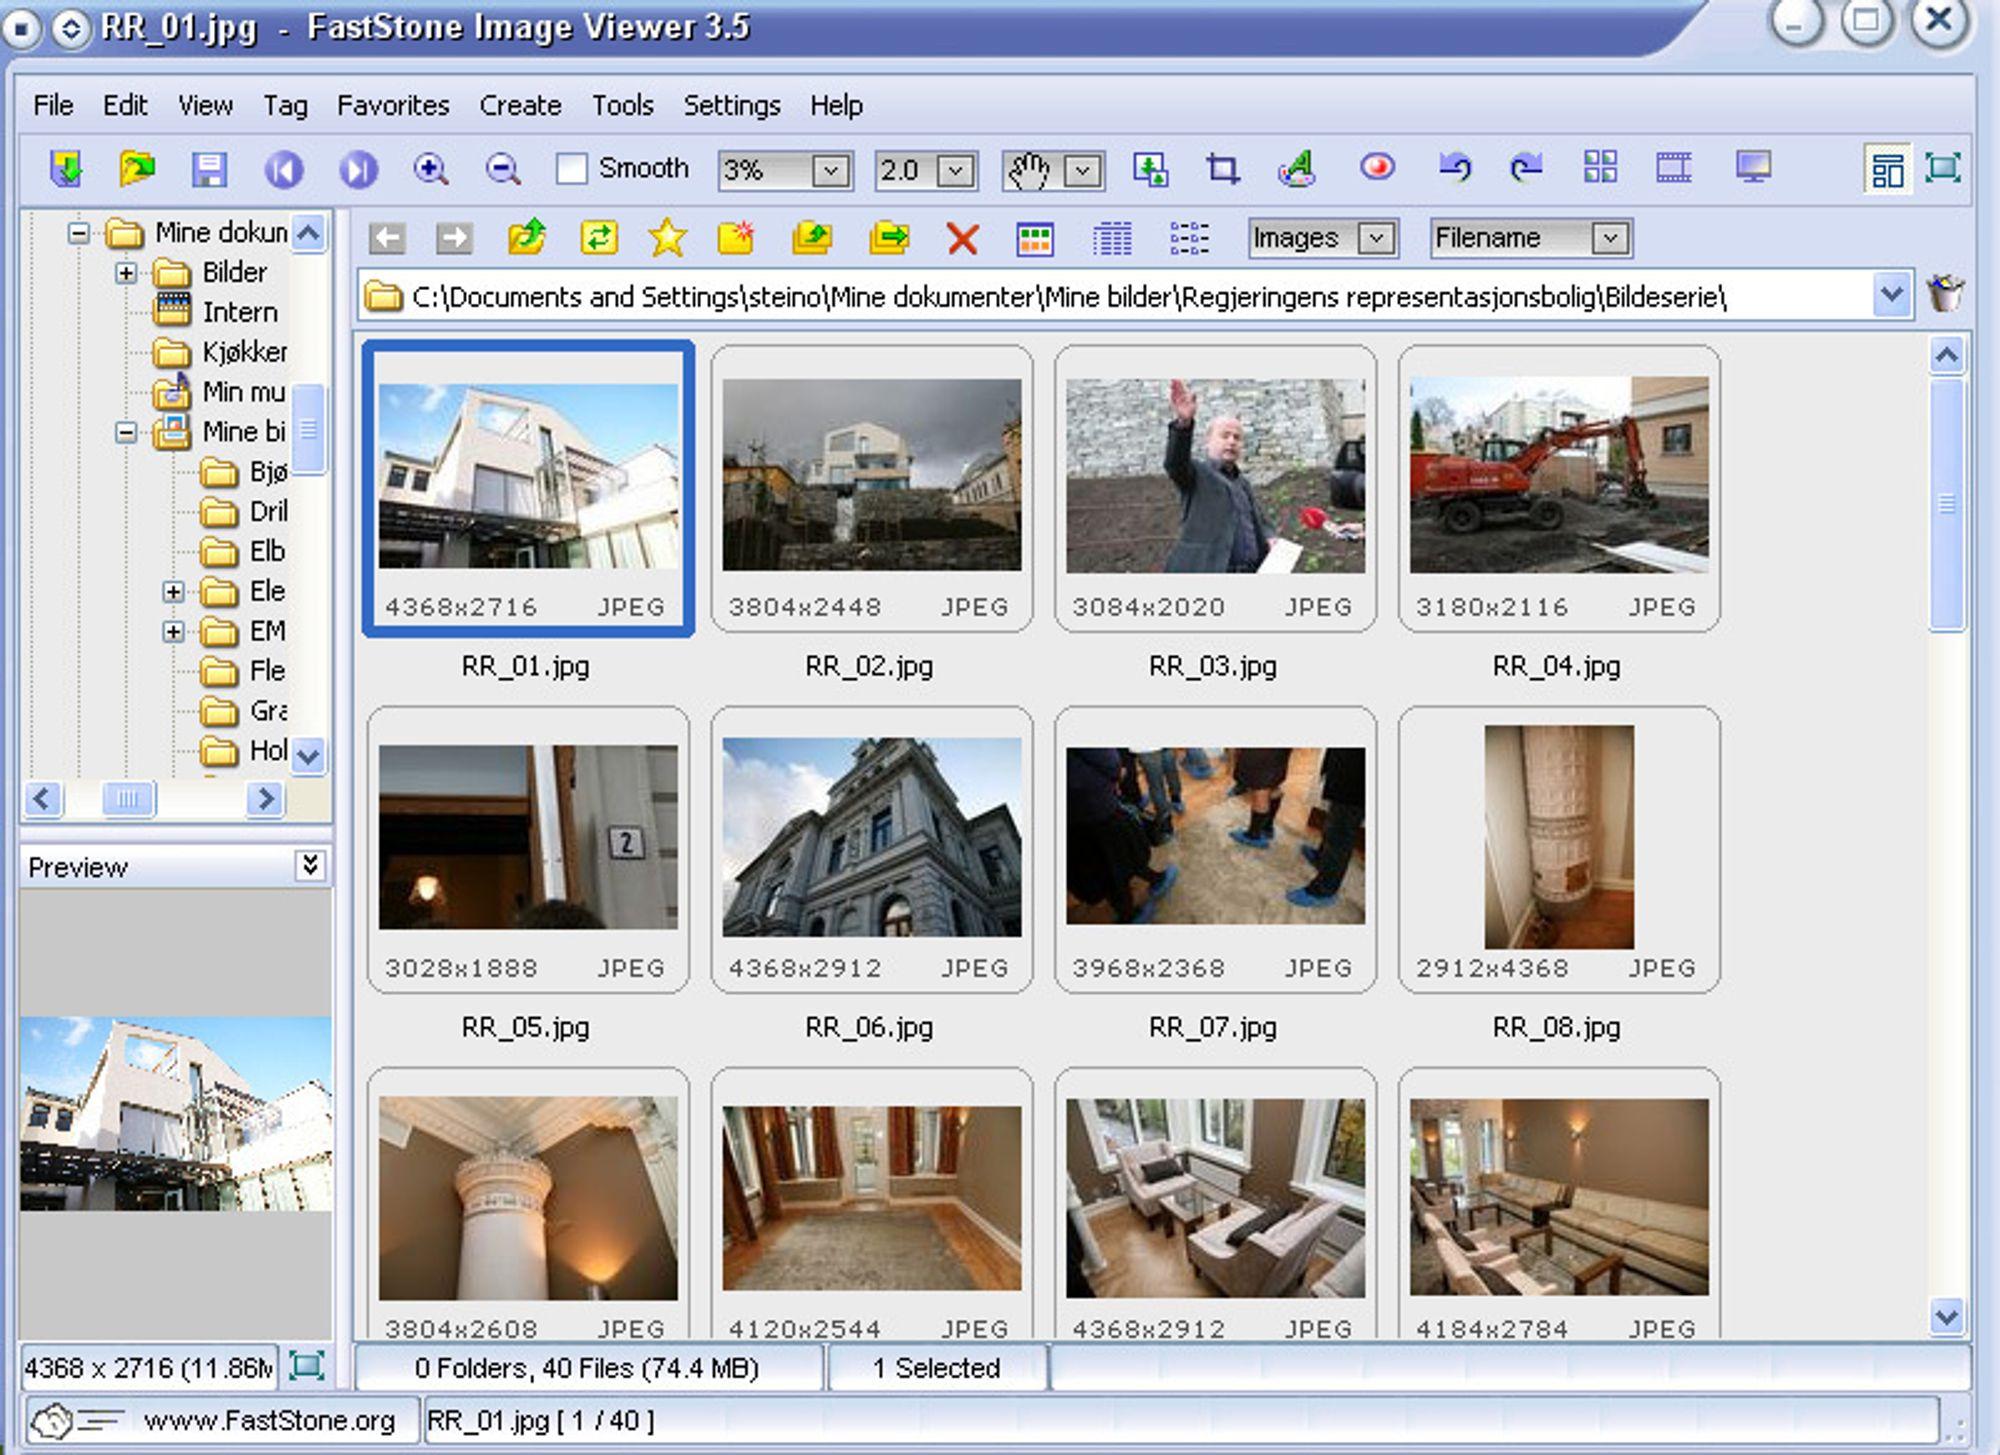 Ukens gratisprogram: Faststone Image Viewer